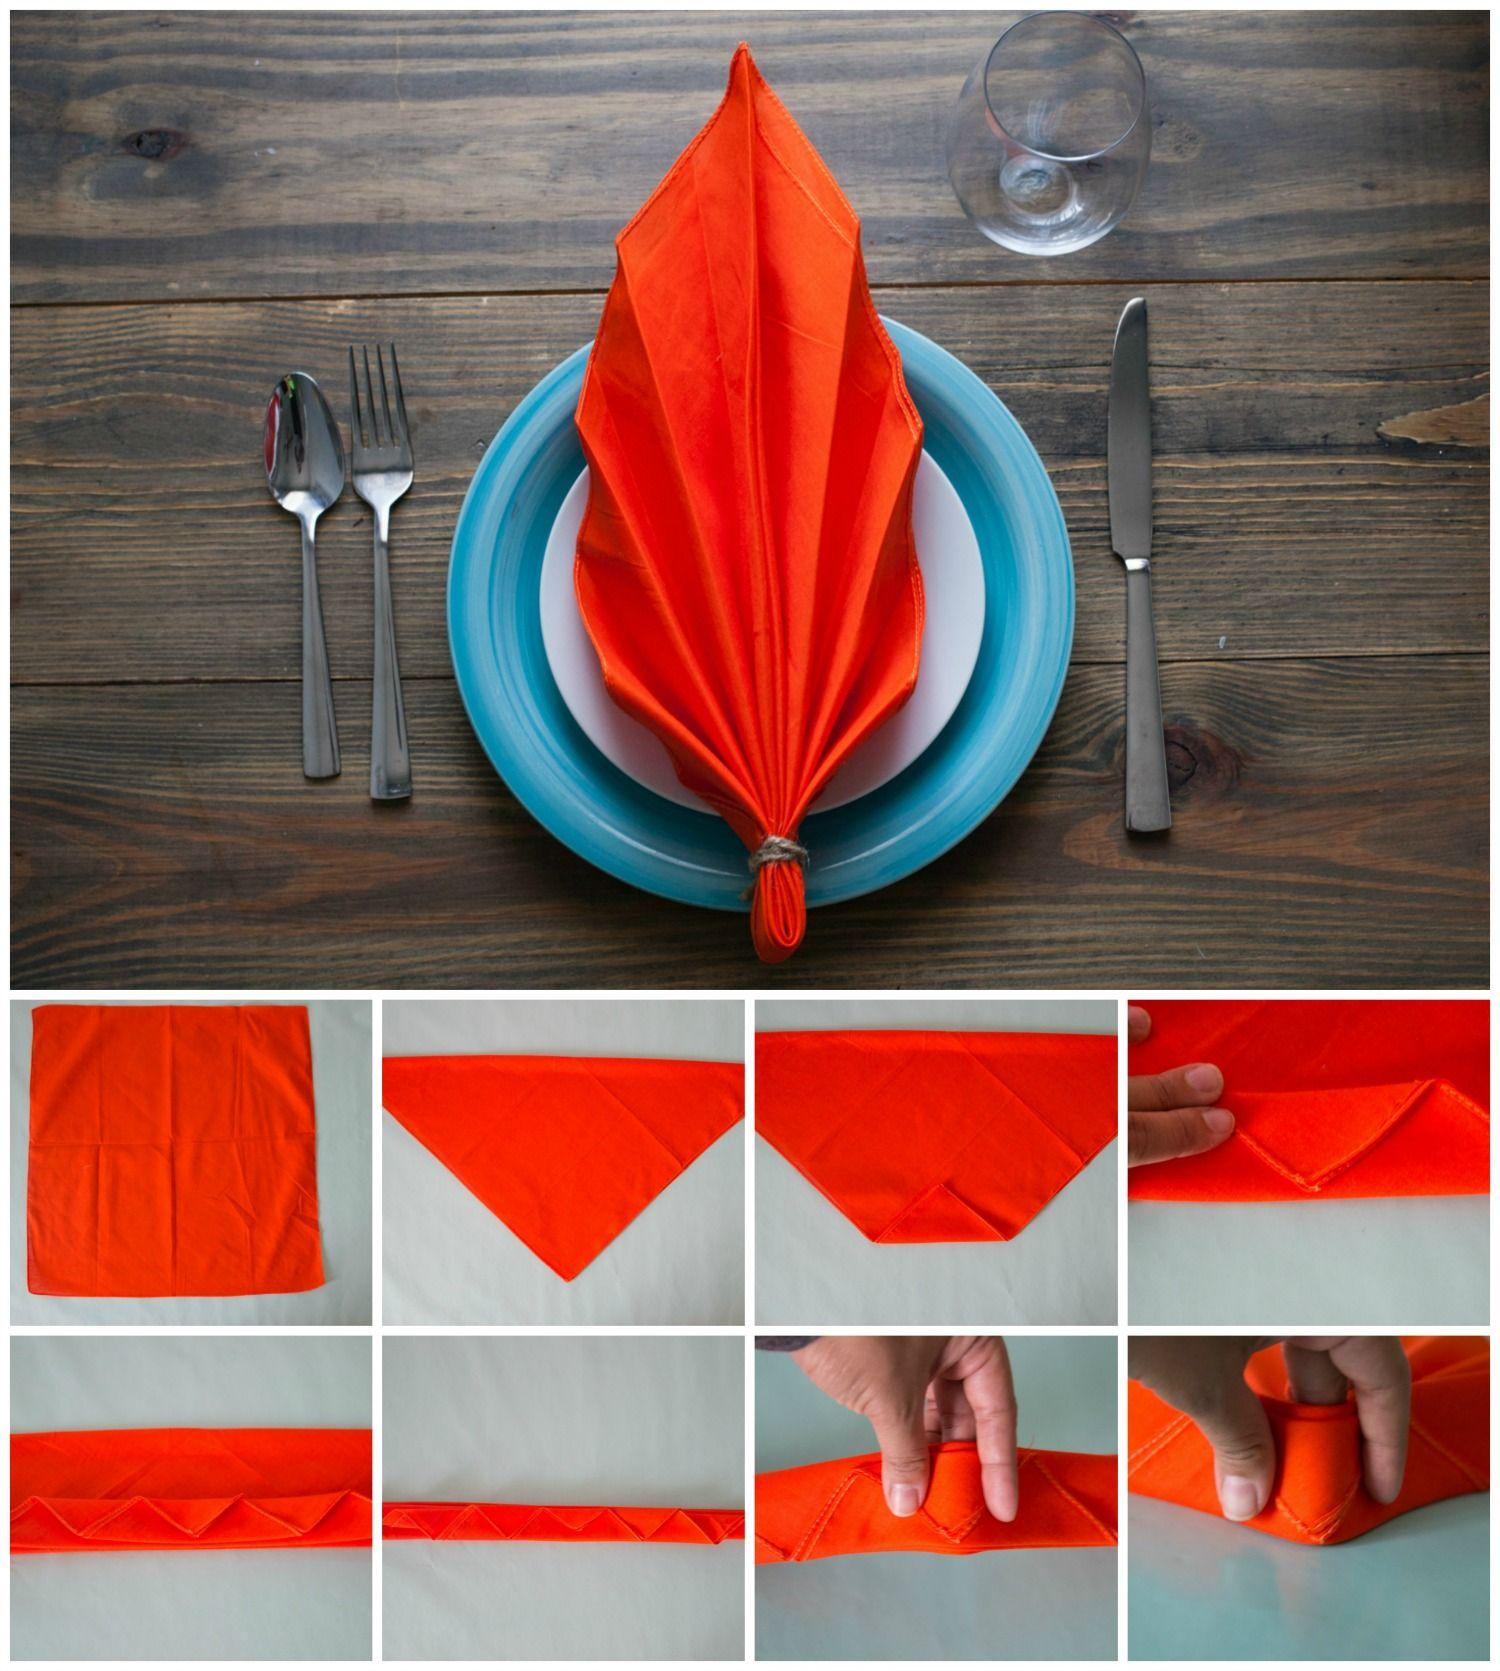 10 Ways To Fold Napkins Paper Napkin Folding Napkin Folding Thanksgiving Napkin Folds